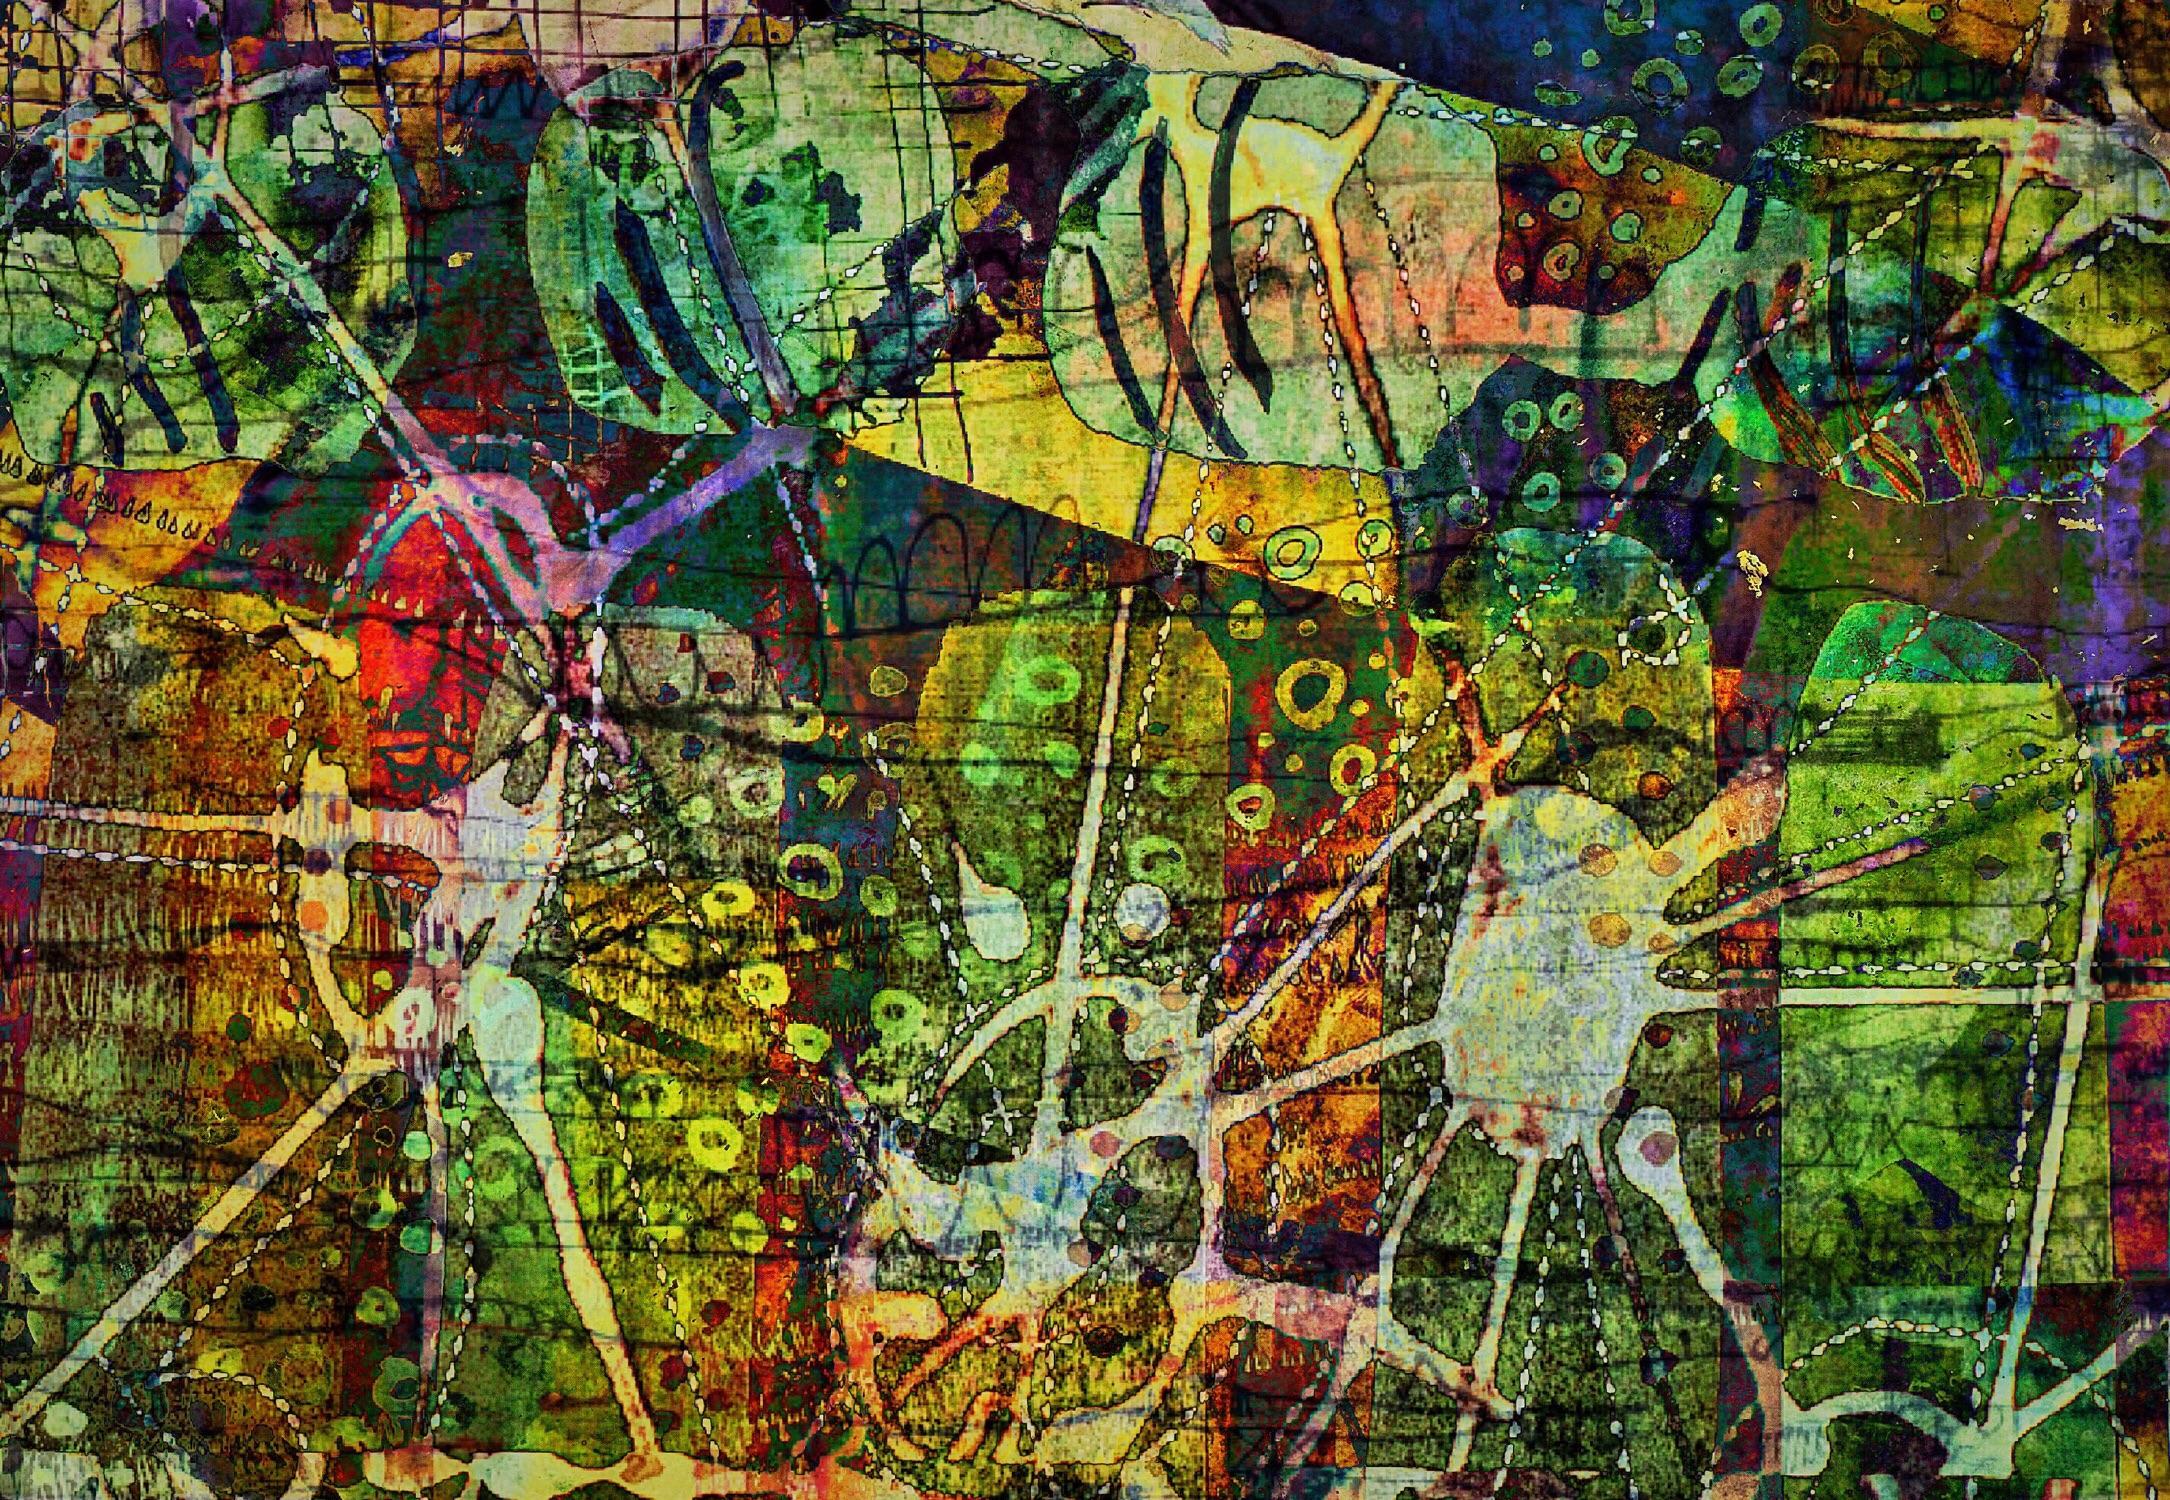 David Schuster ~ world of merriment